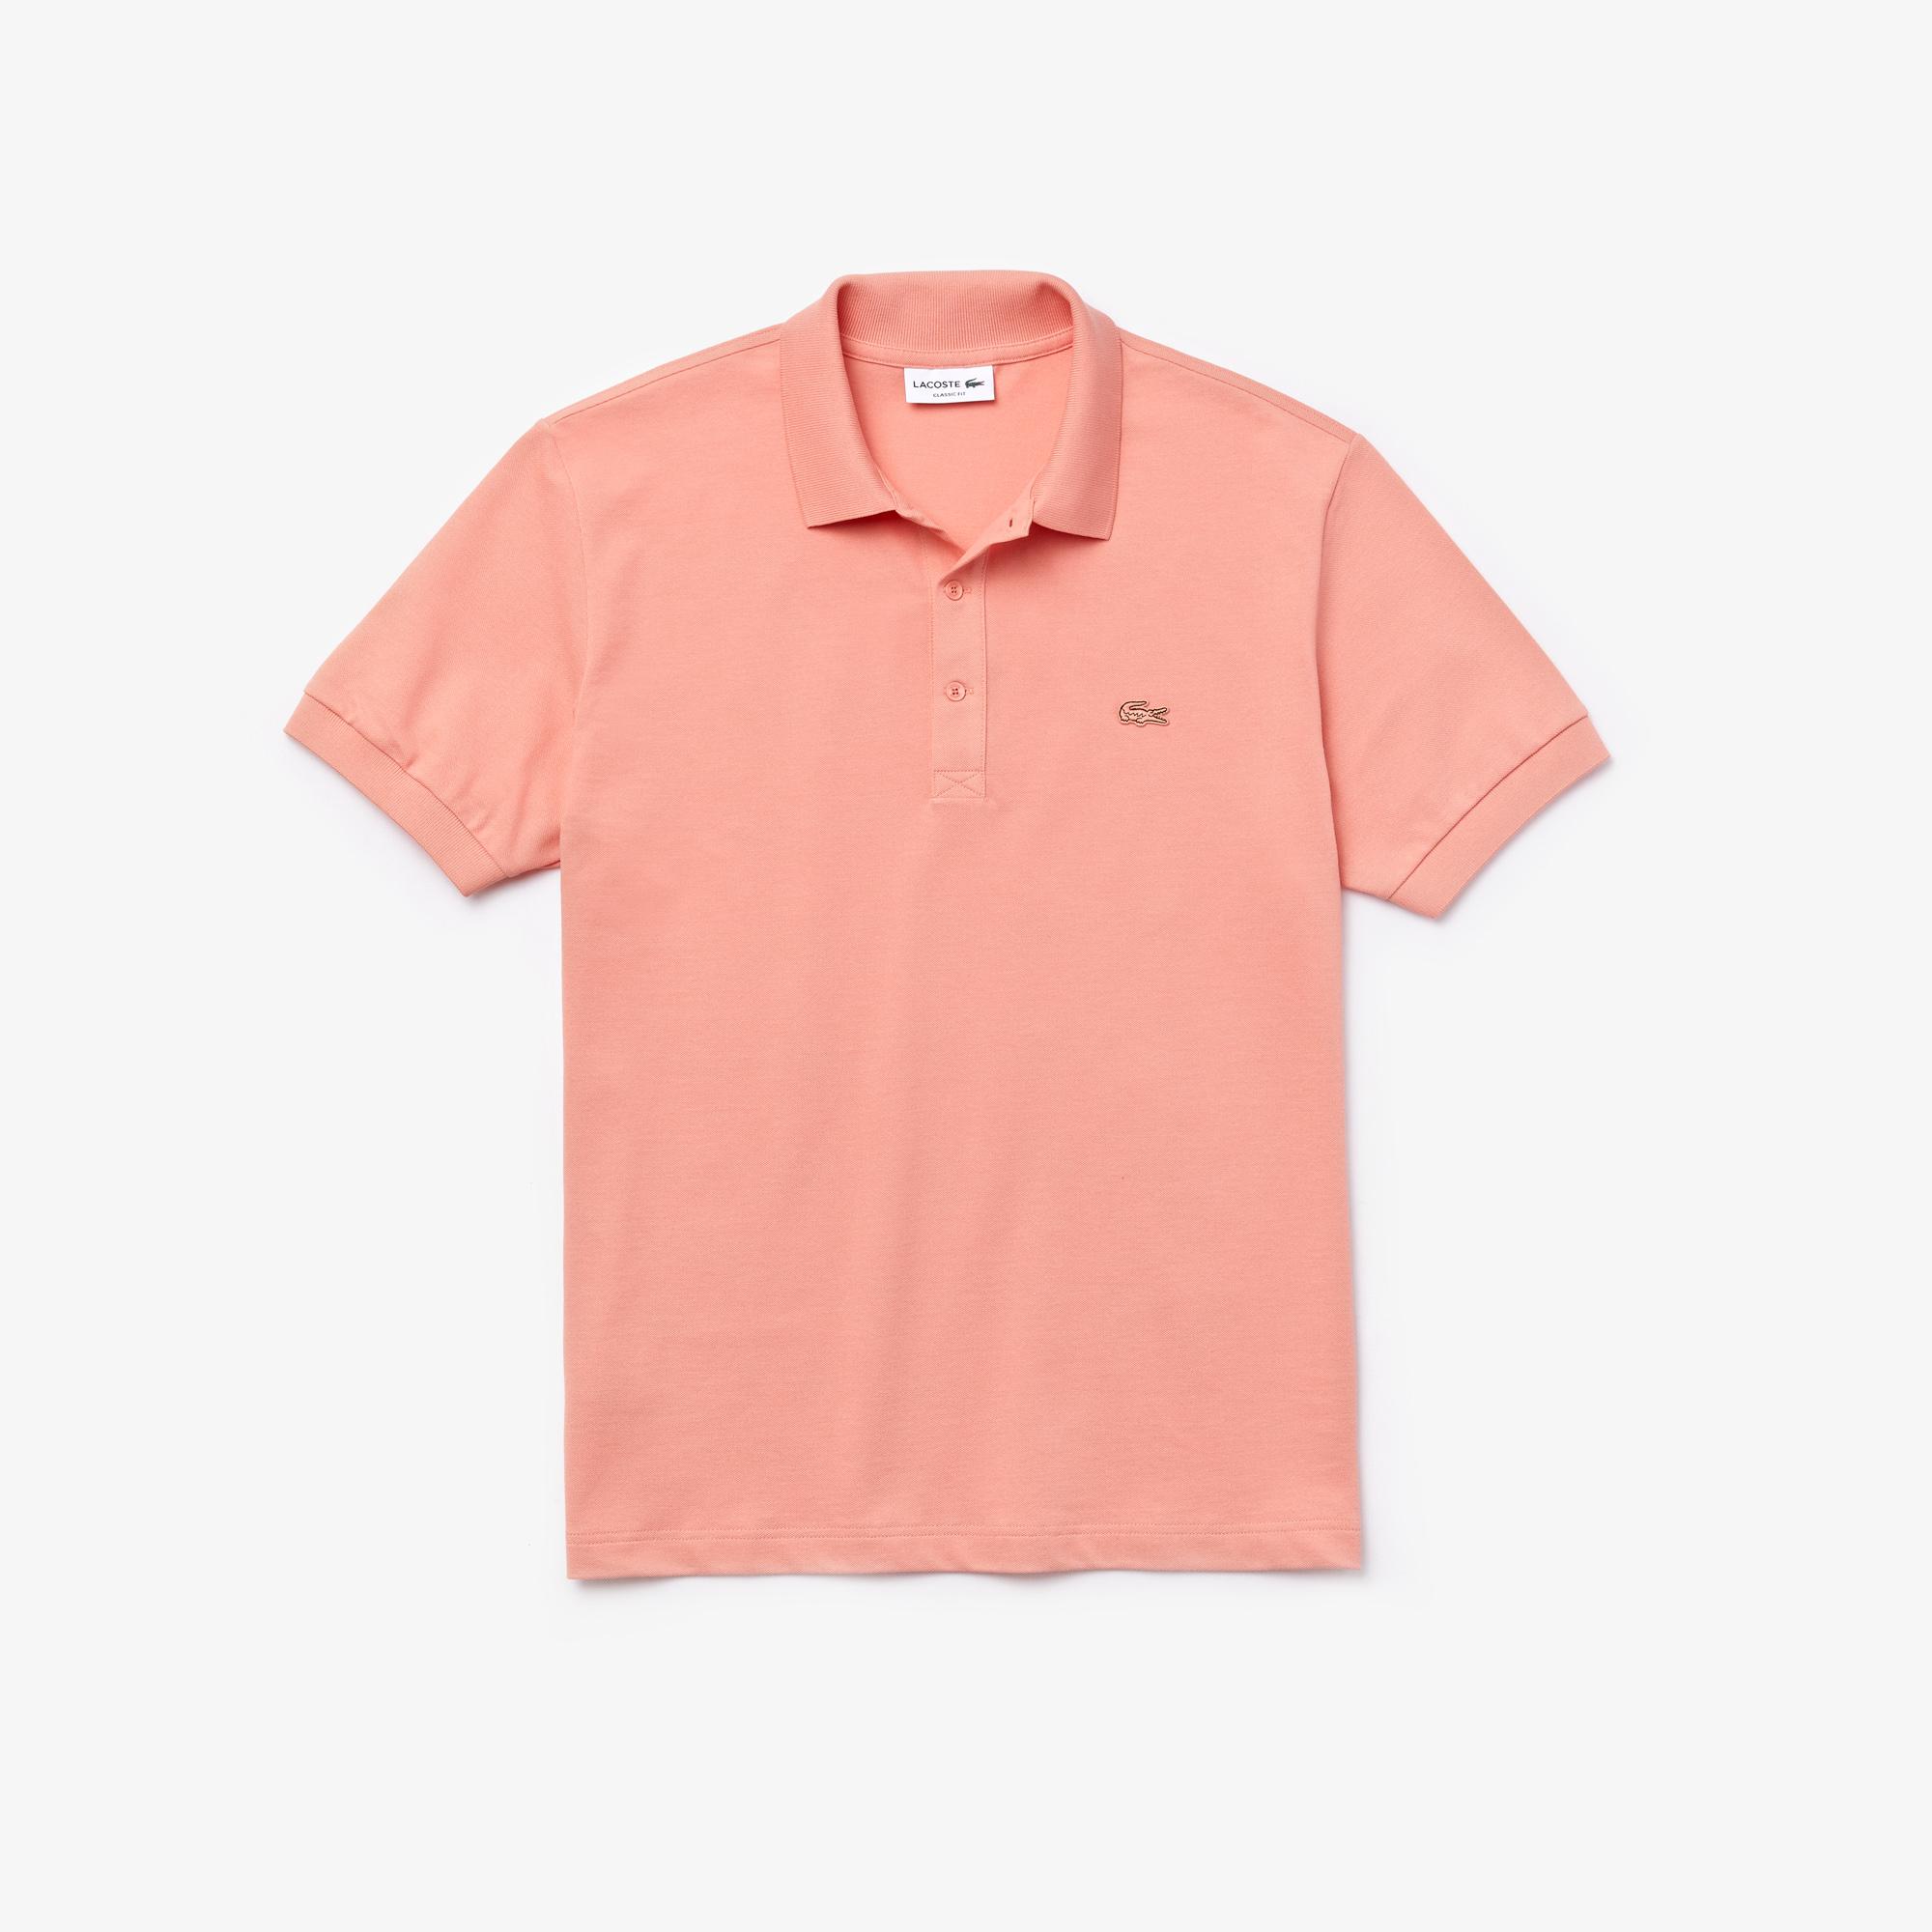 Lacoste Men's Classic Fit Polo Shirt